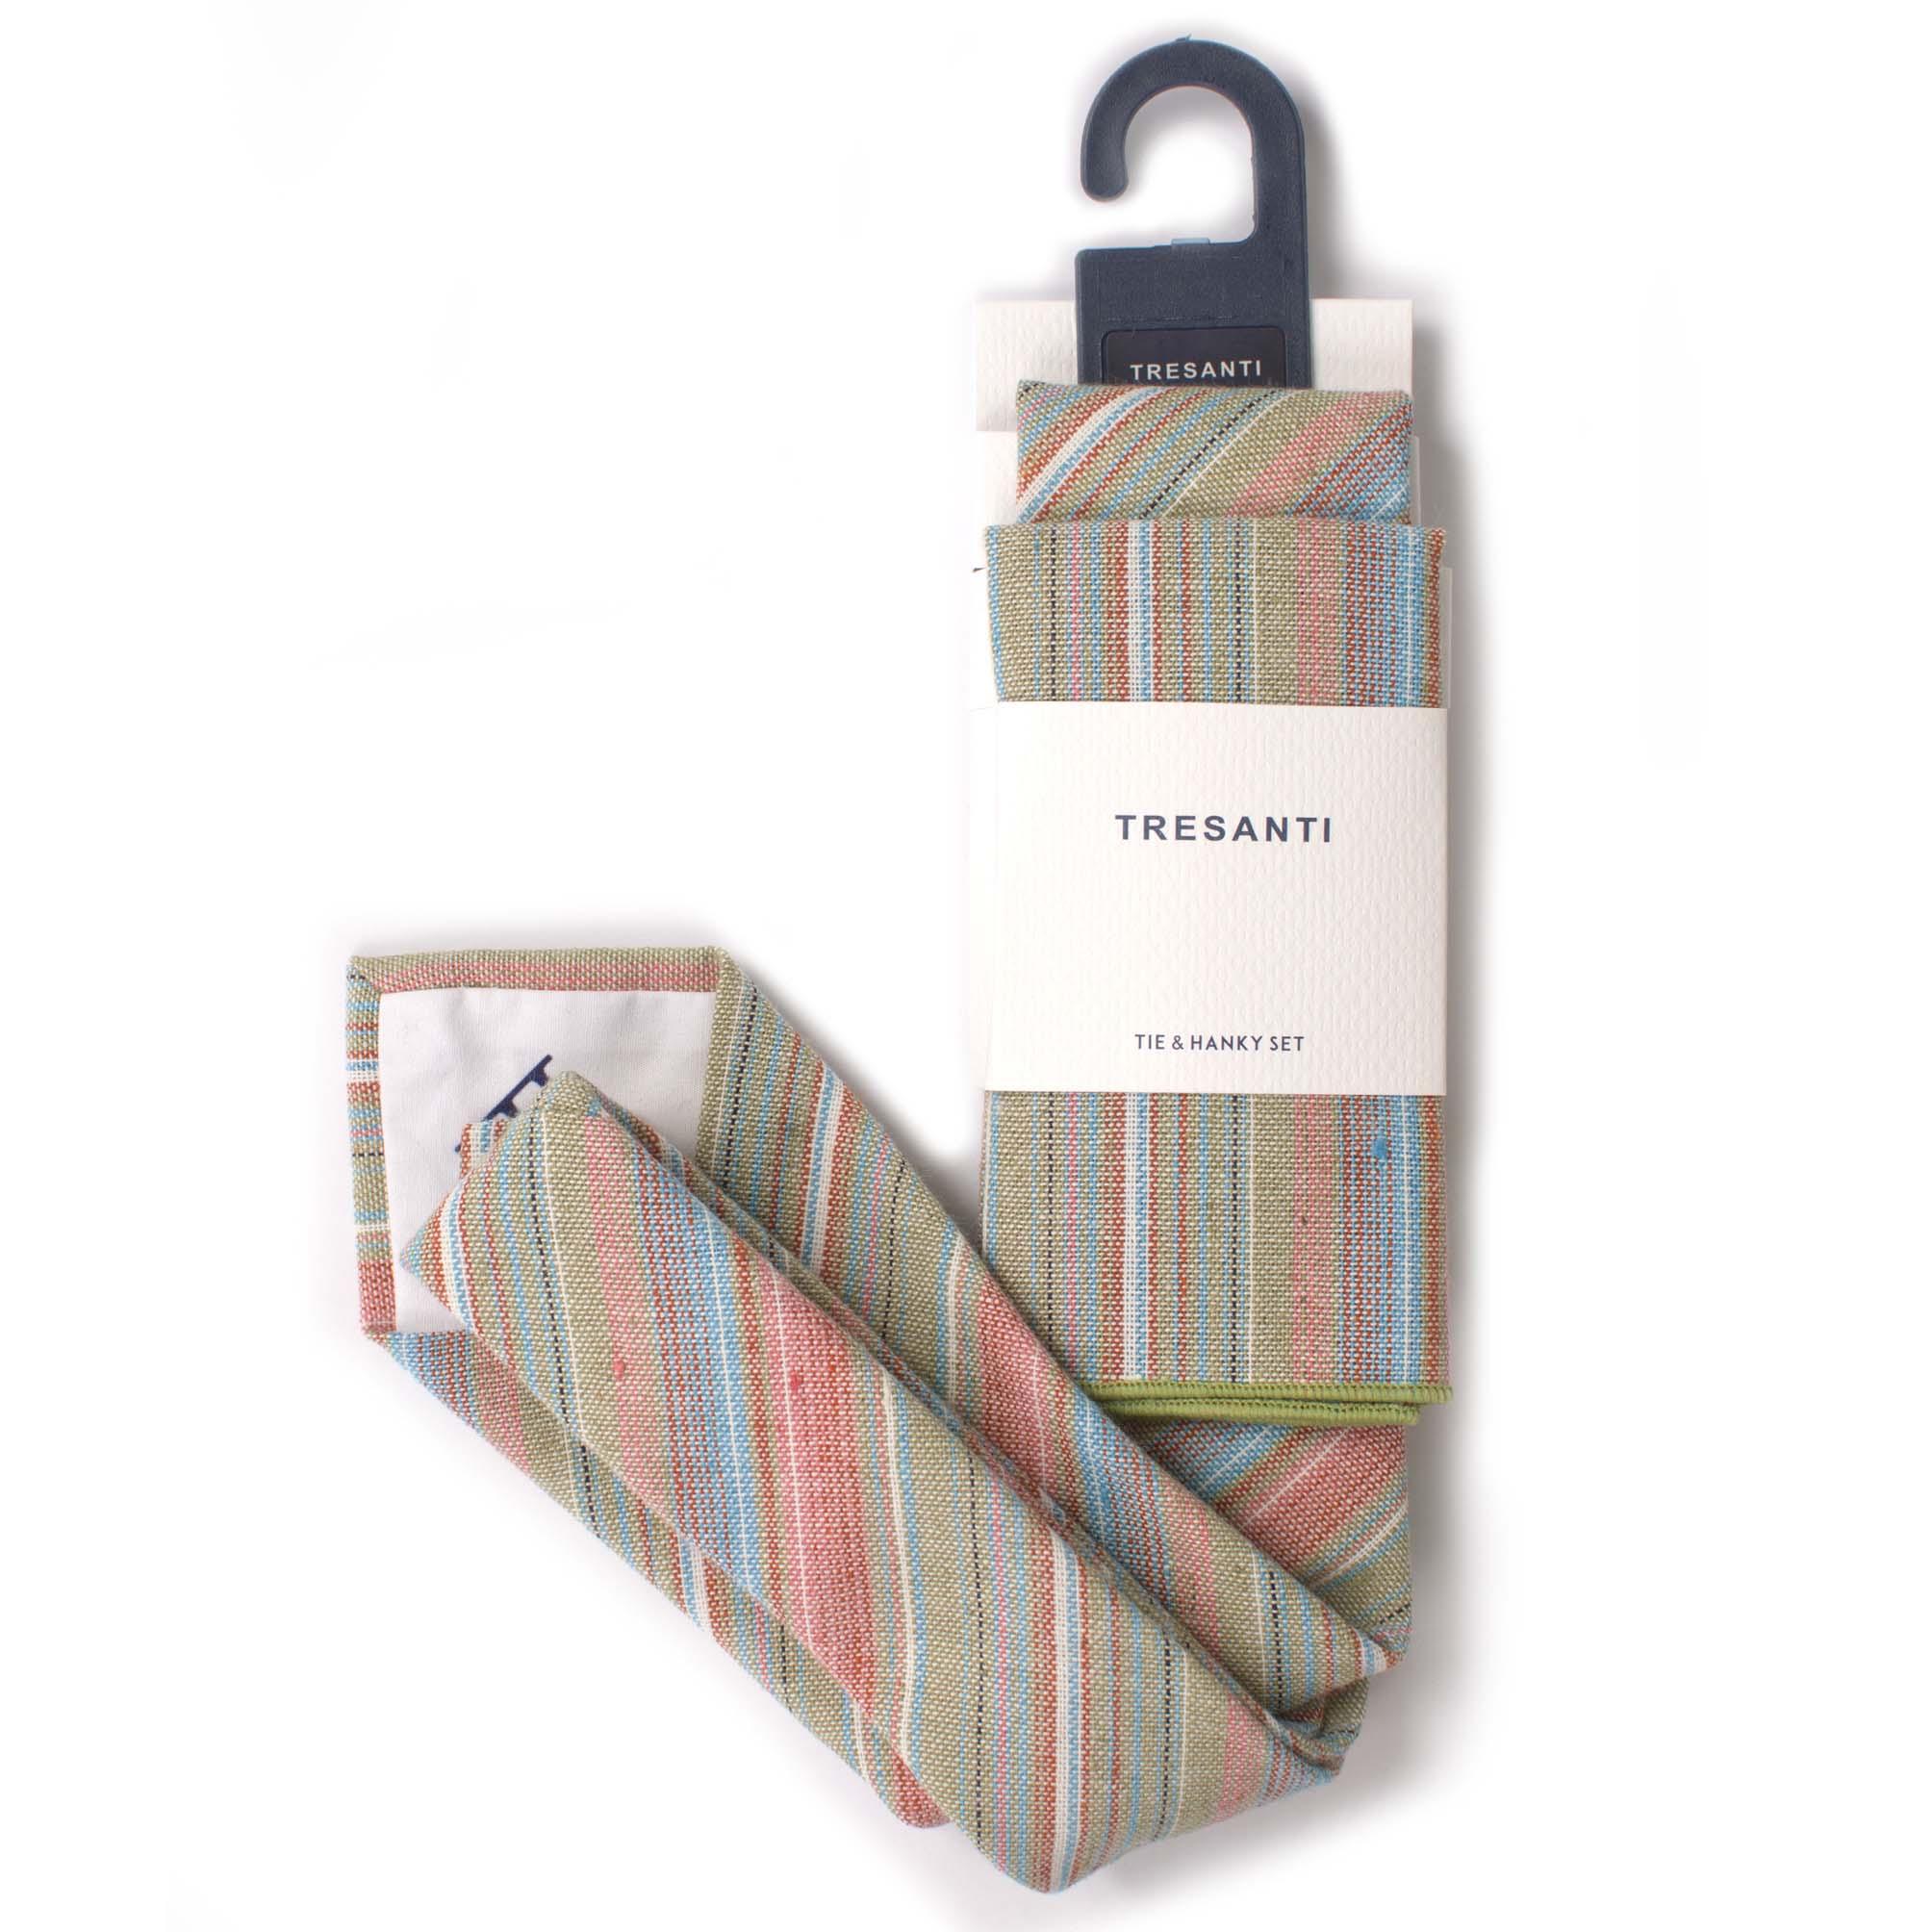 Linen set tie & hanky stripes